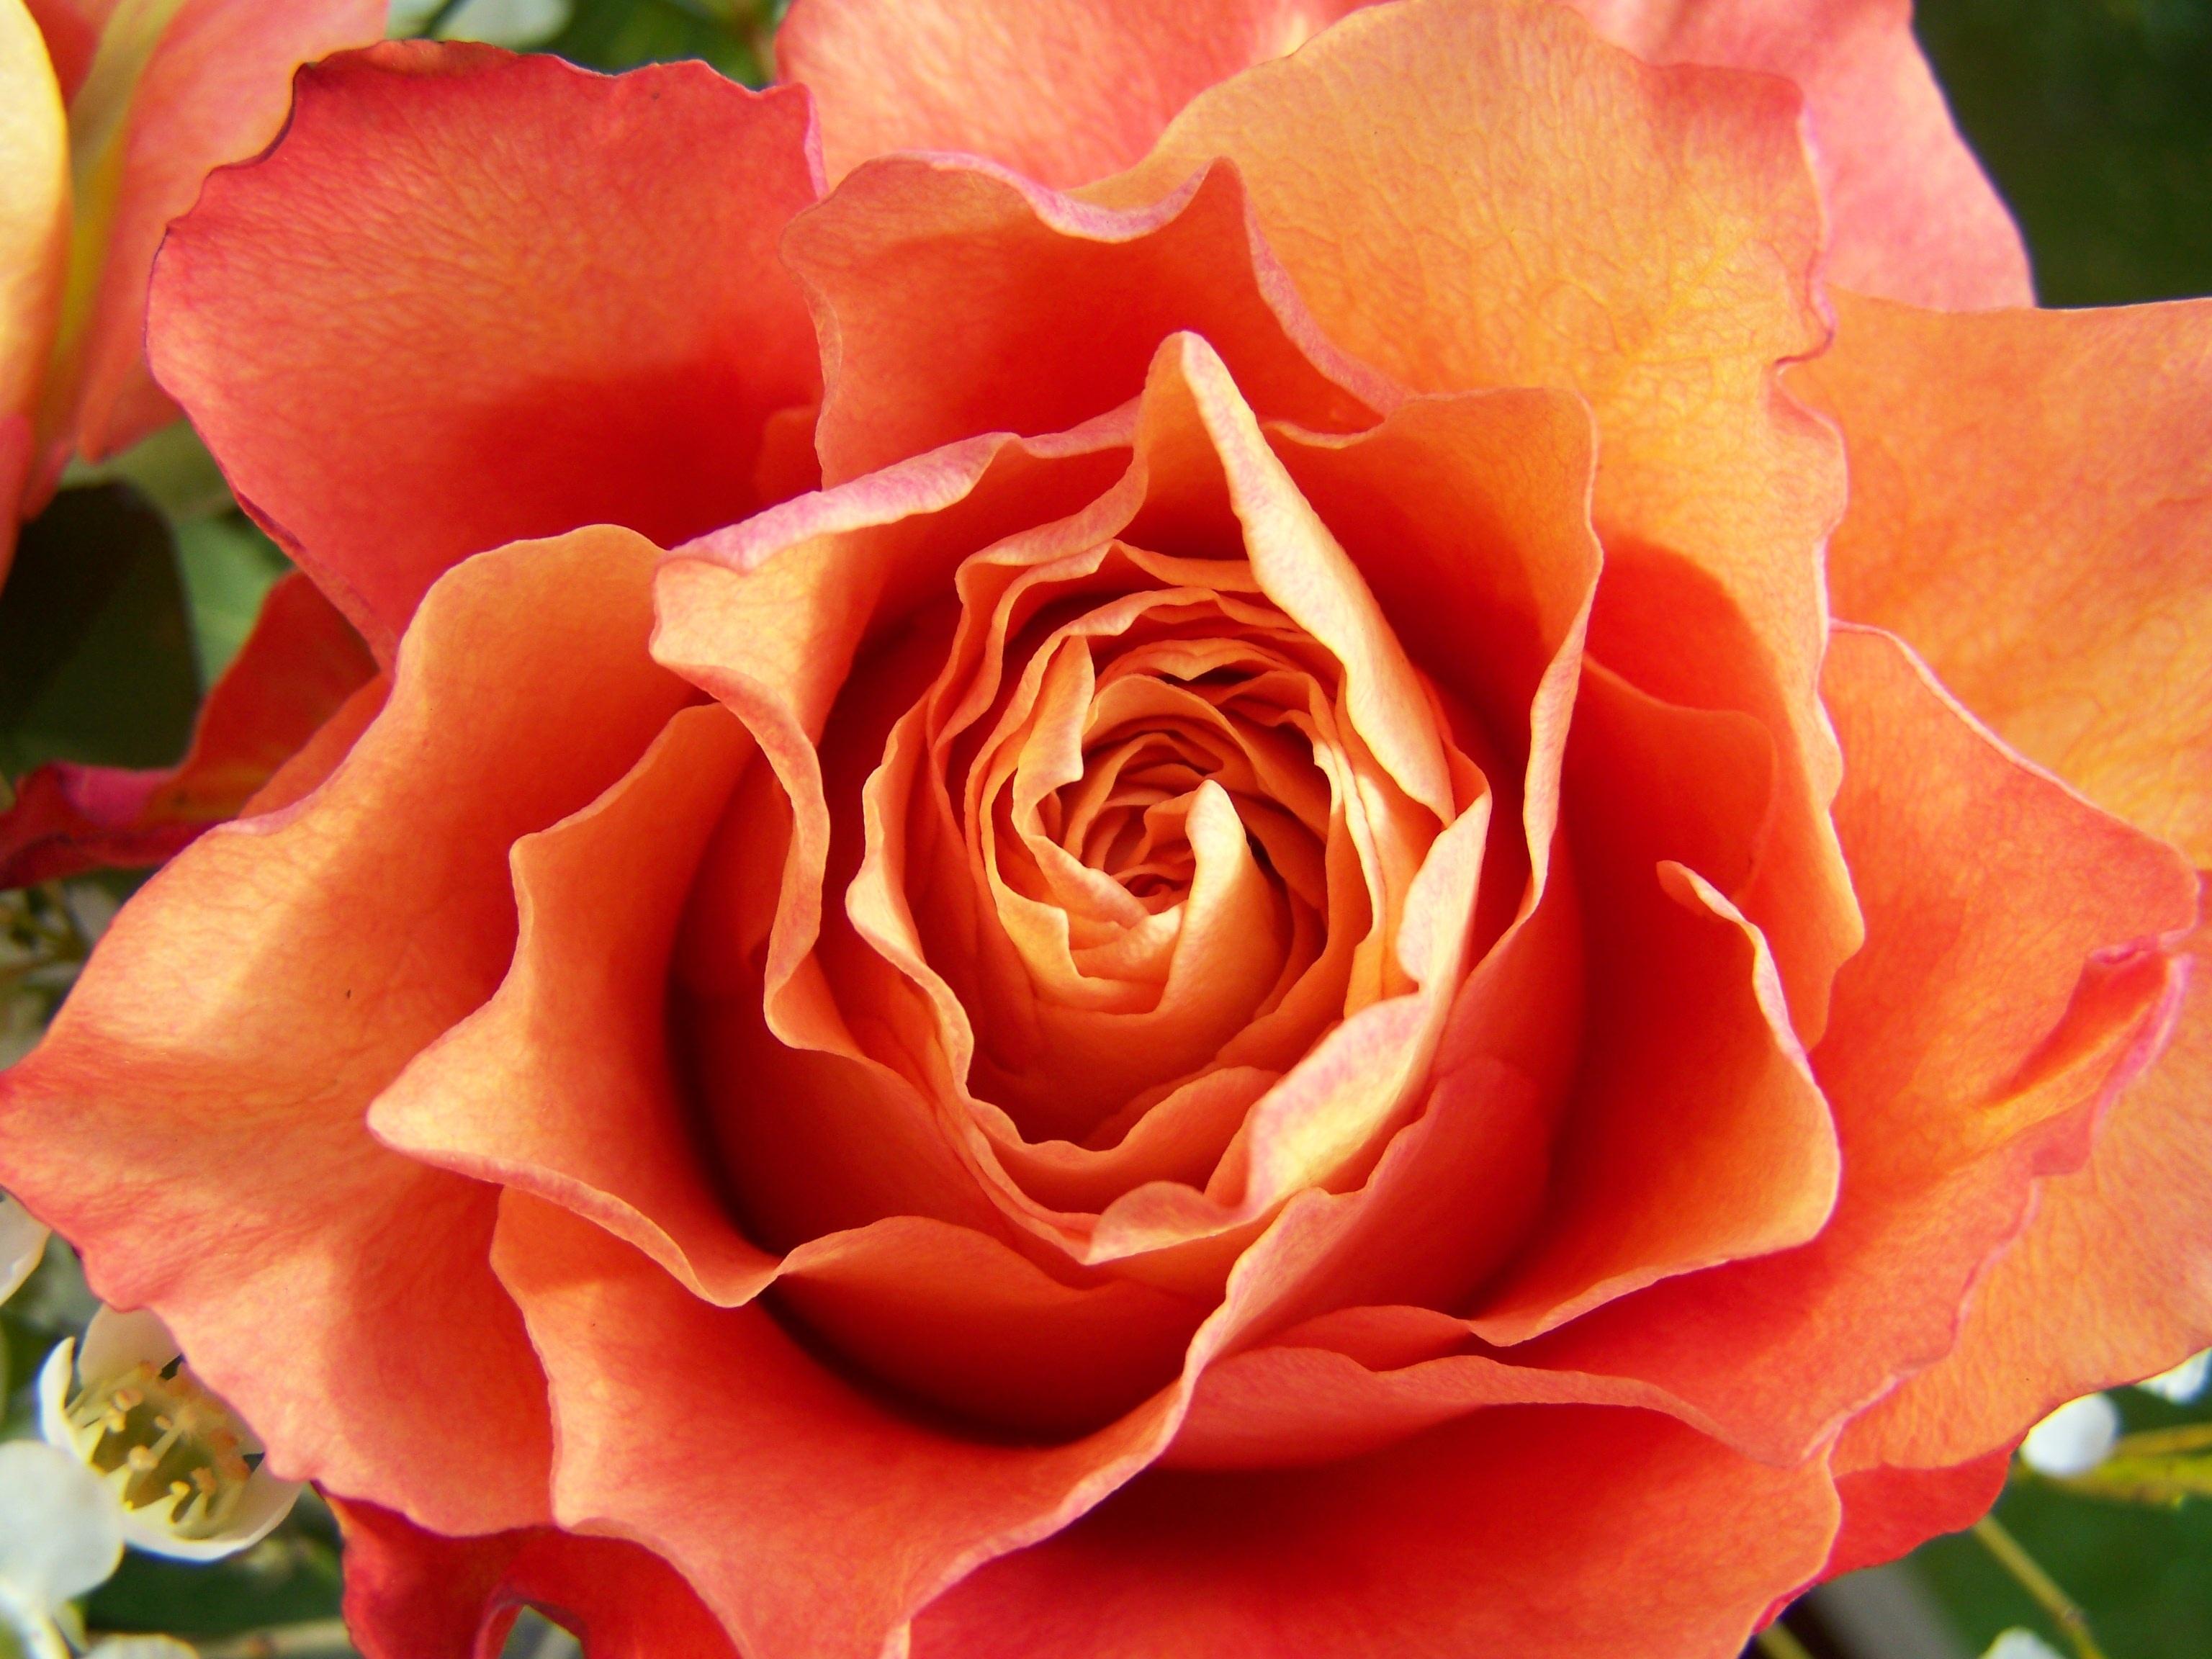 Free Images Petal Red Cut Flower Floribunda Macro Photography